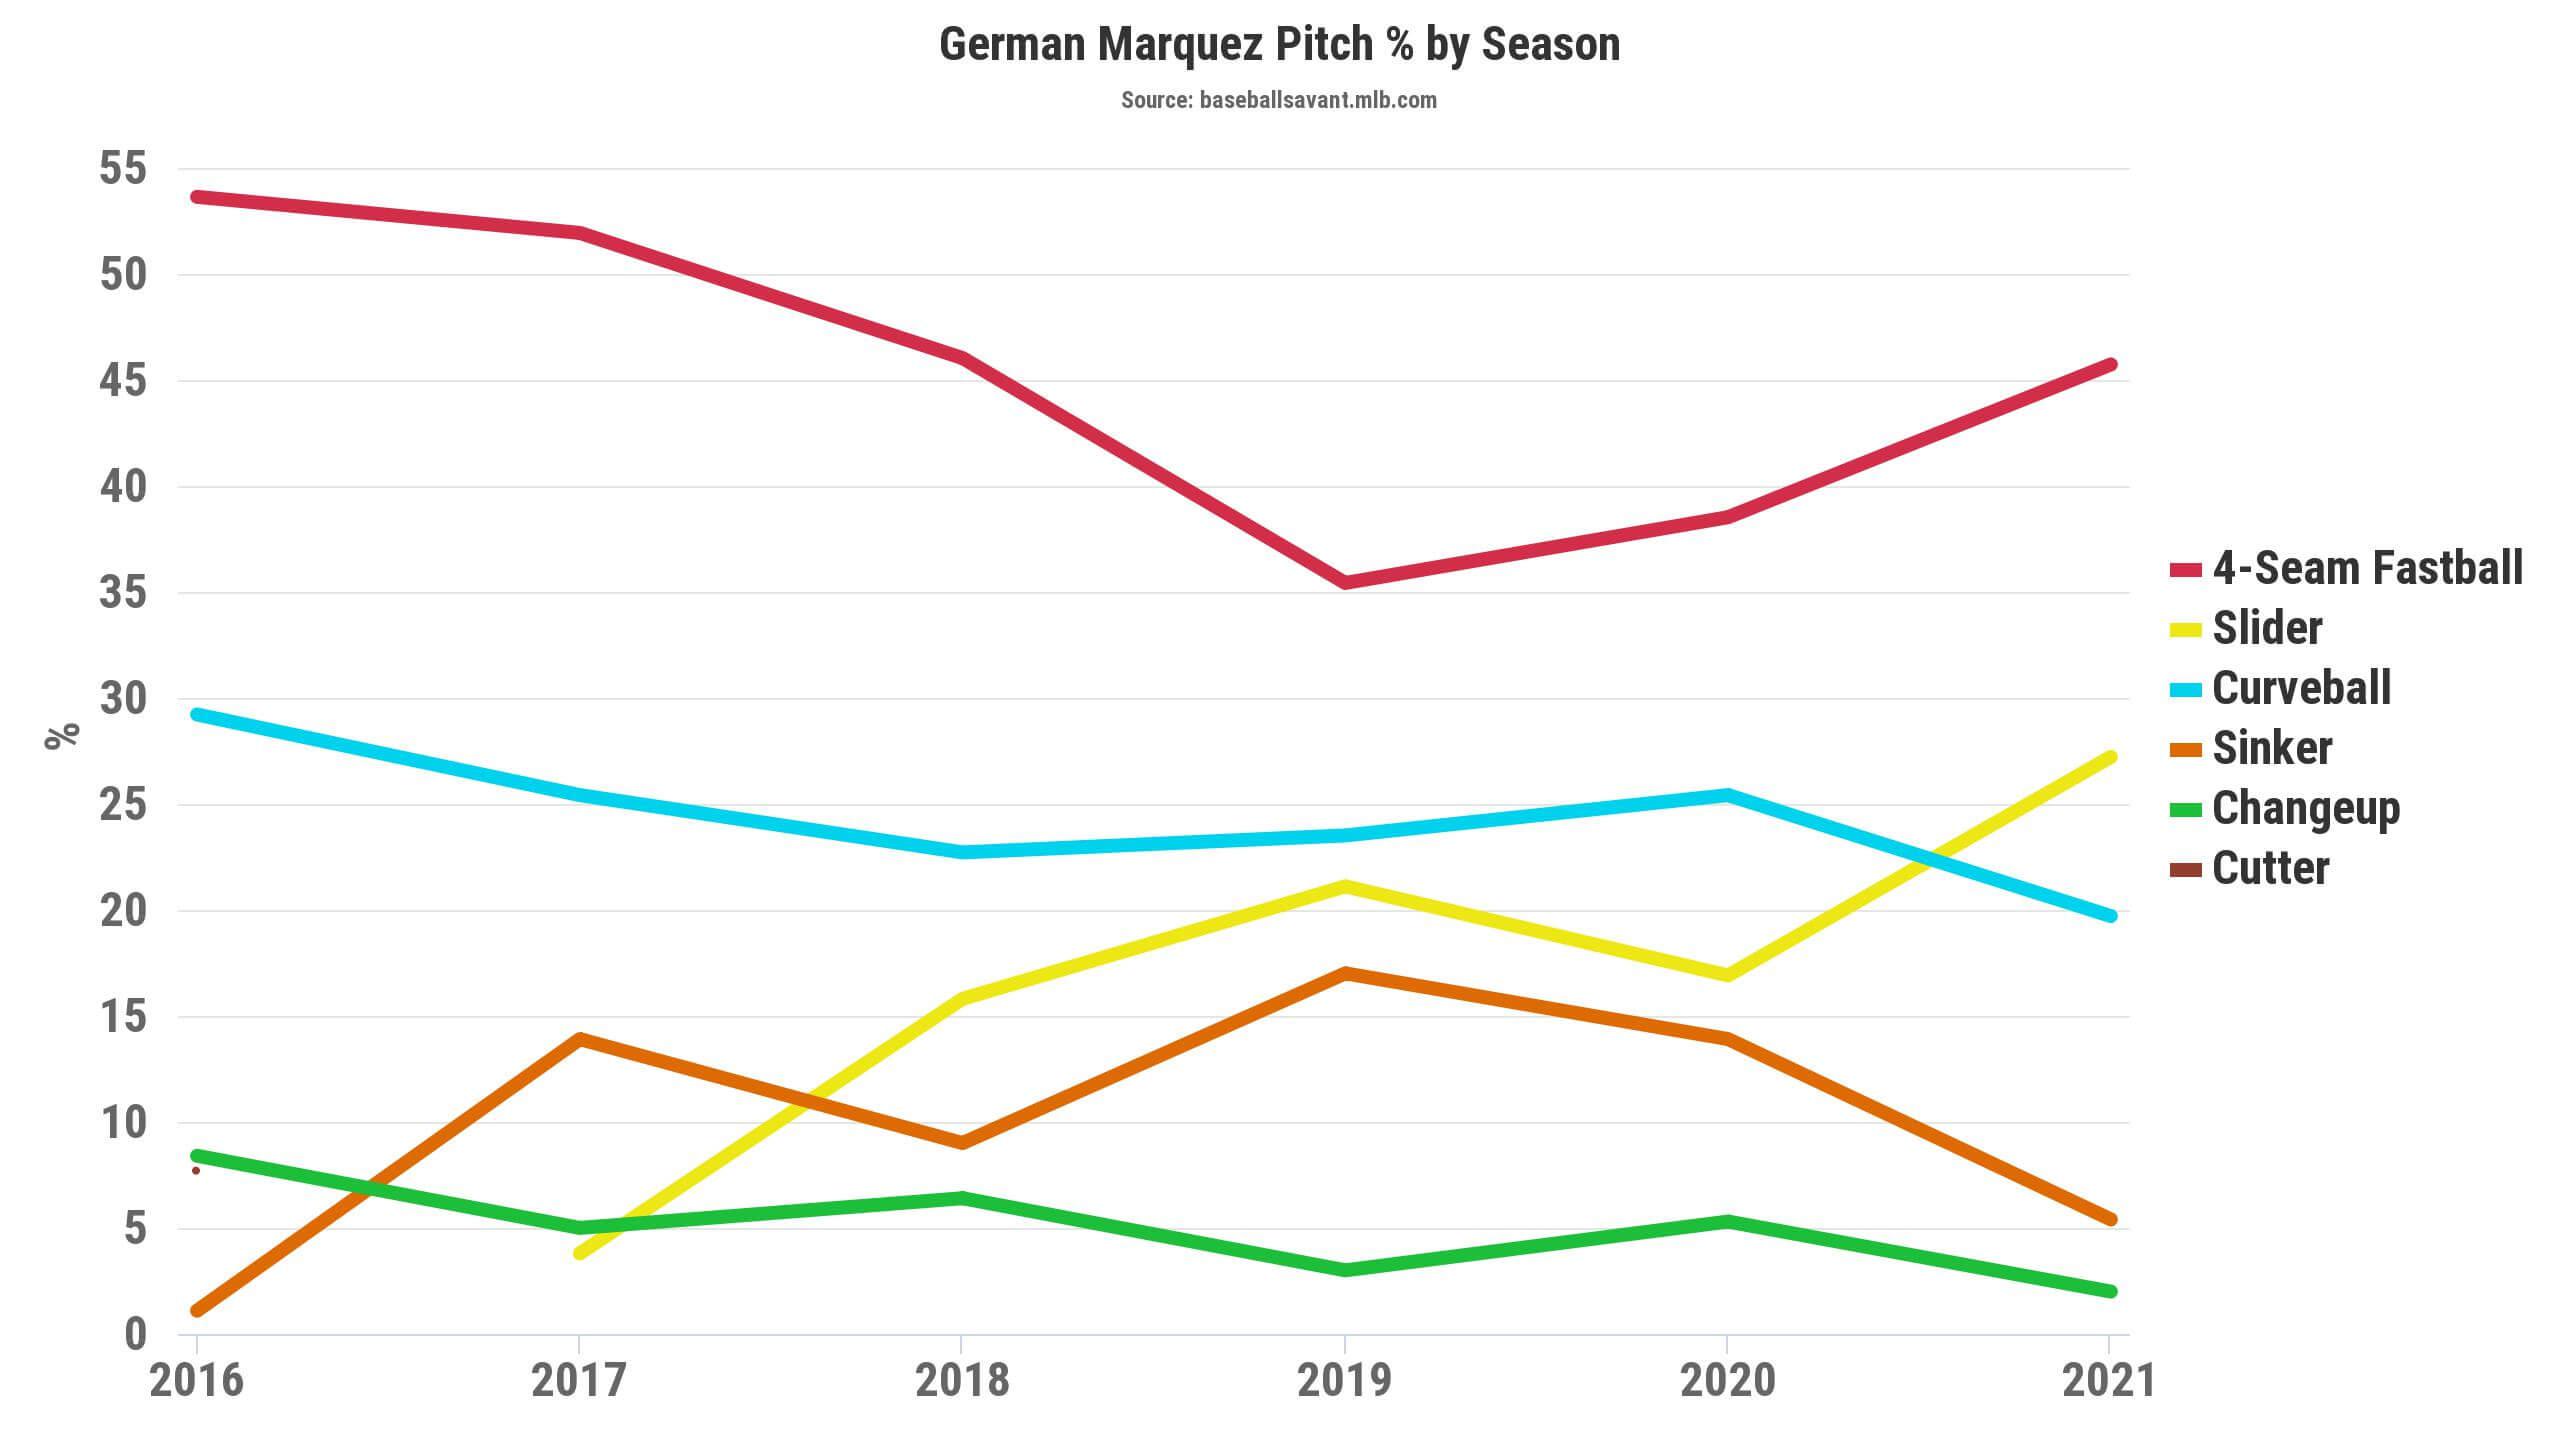 German Marquez Pitch Percentage